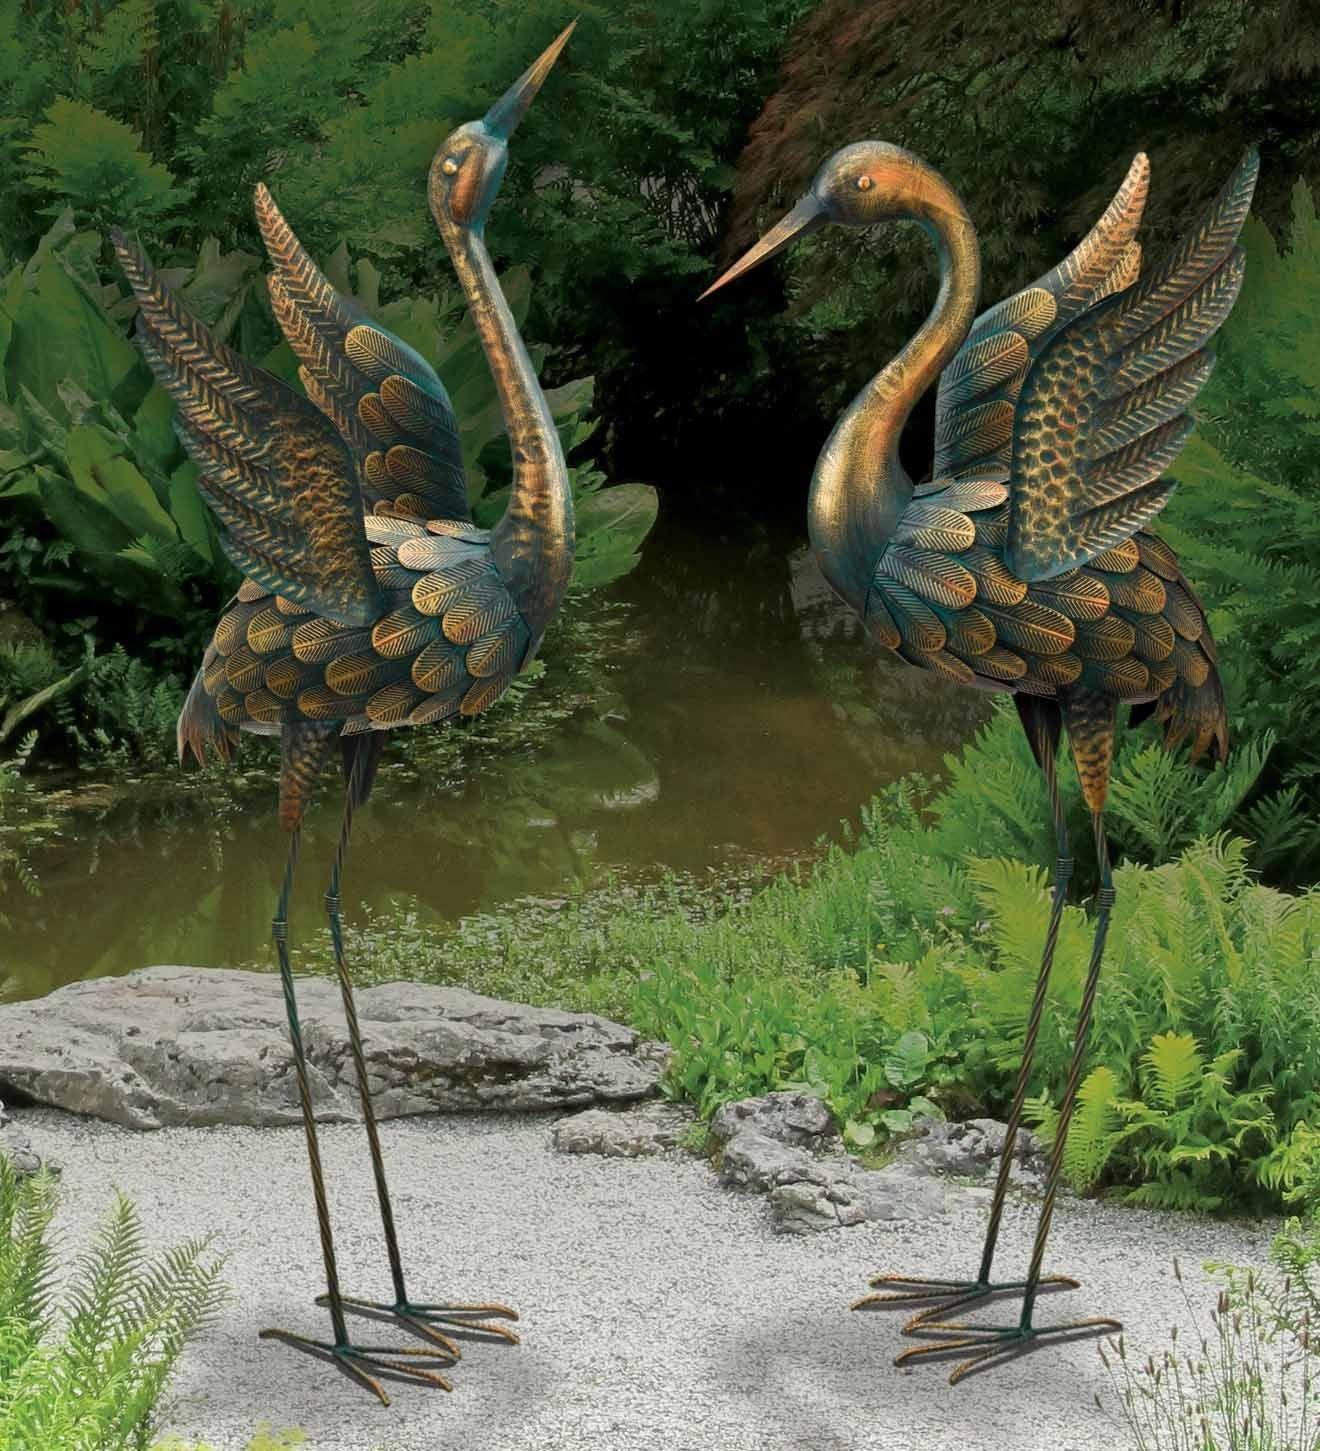 CHSGJY Large Copper Patina Flying Crane Pair Sculpture Heron Bird Yard Art Metal Statue Home Garden Decor